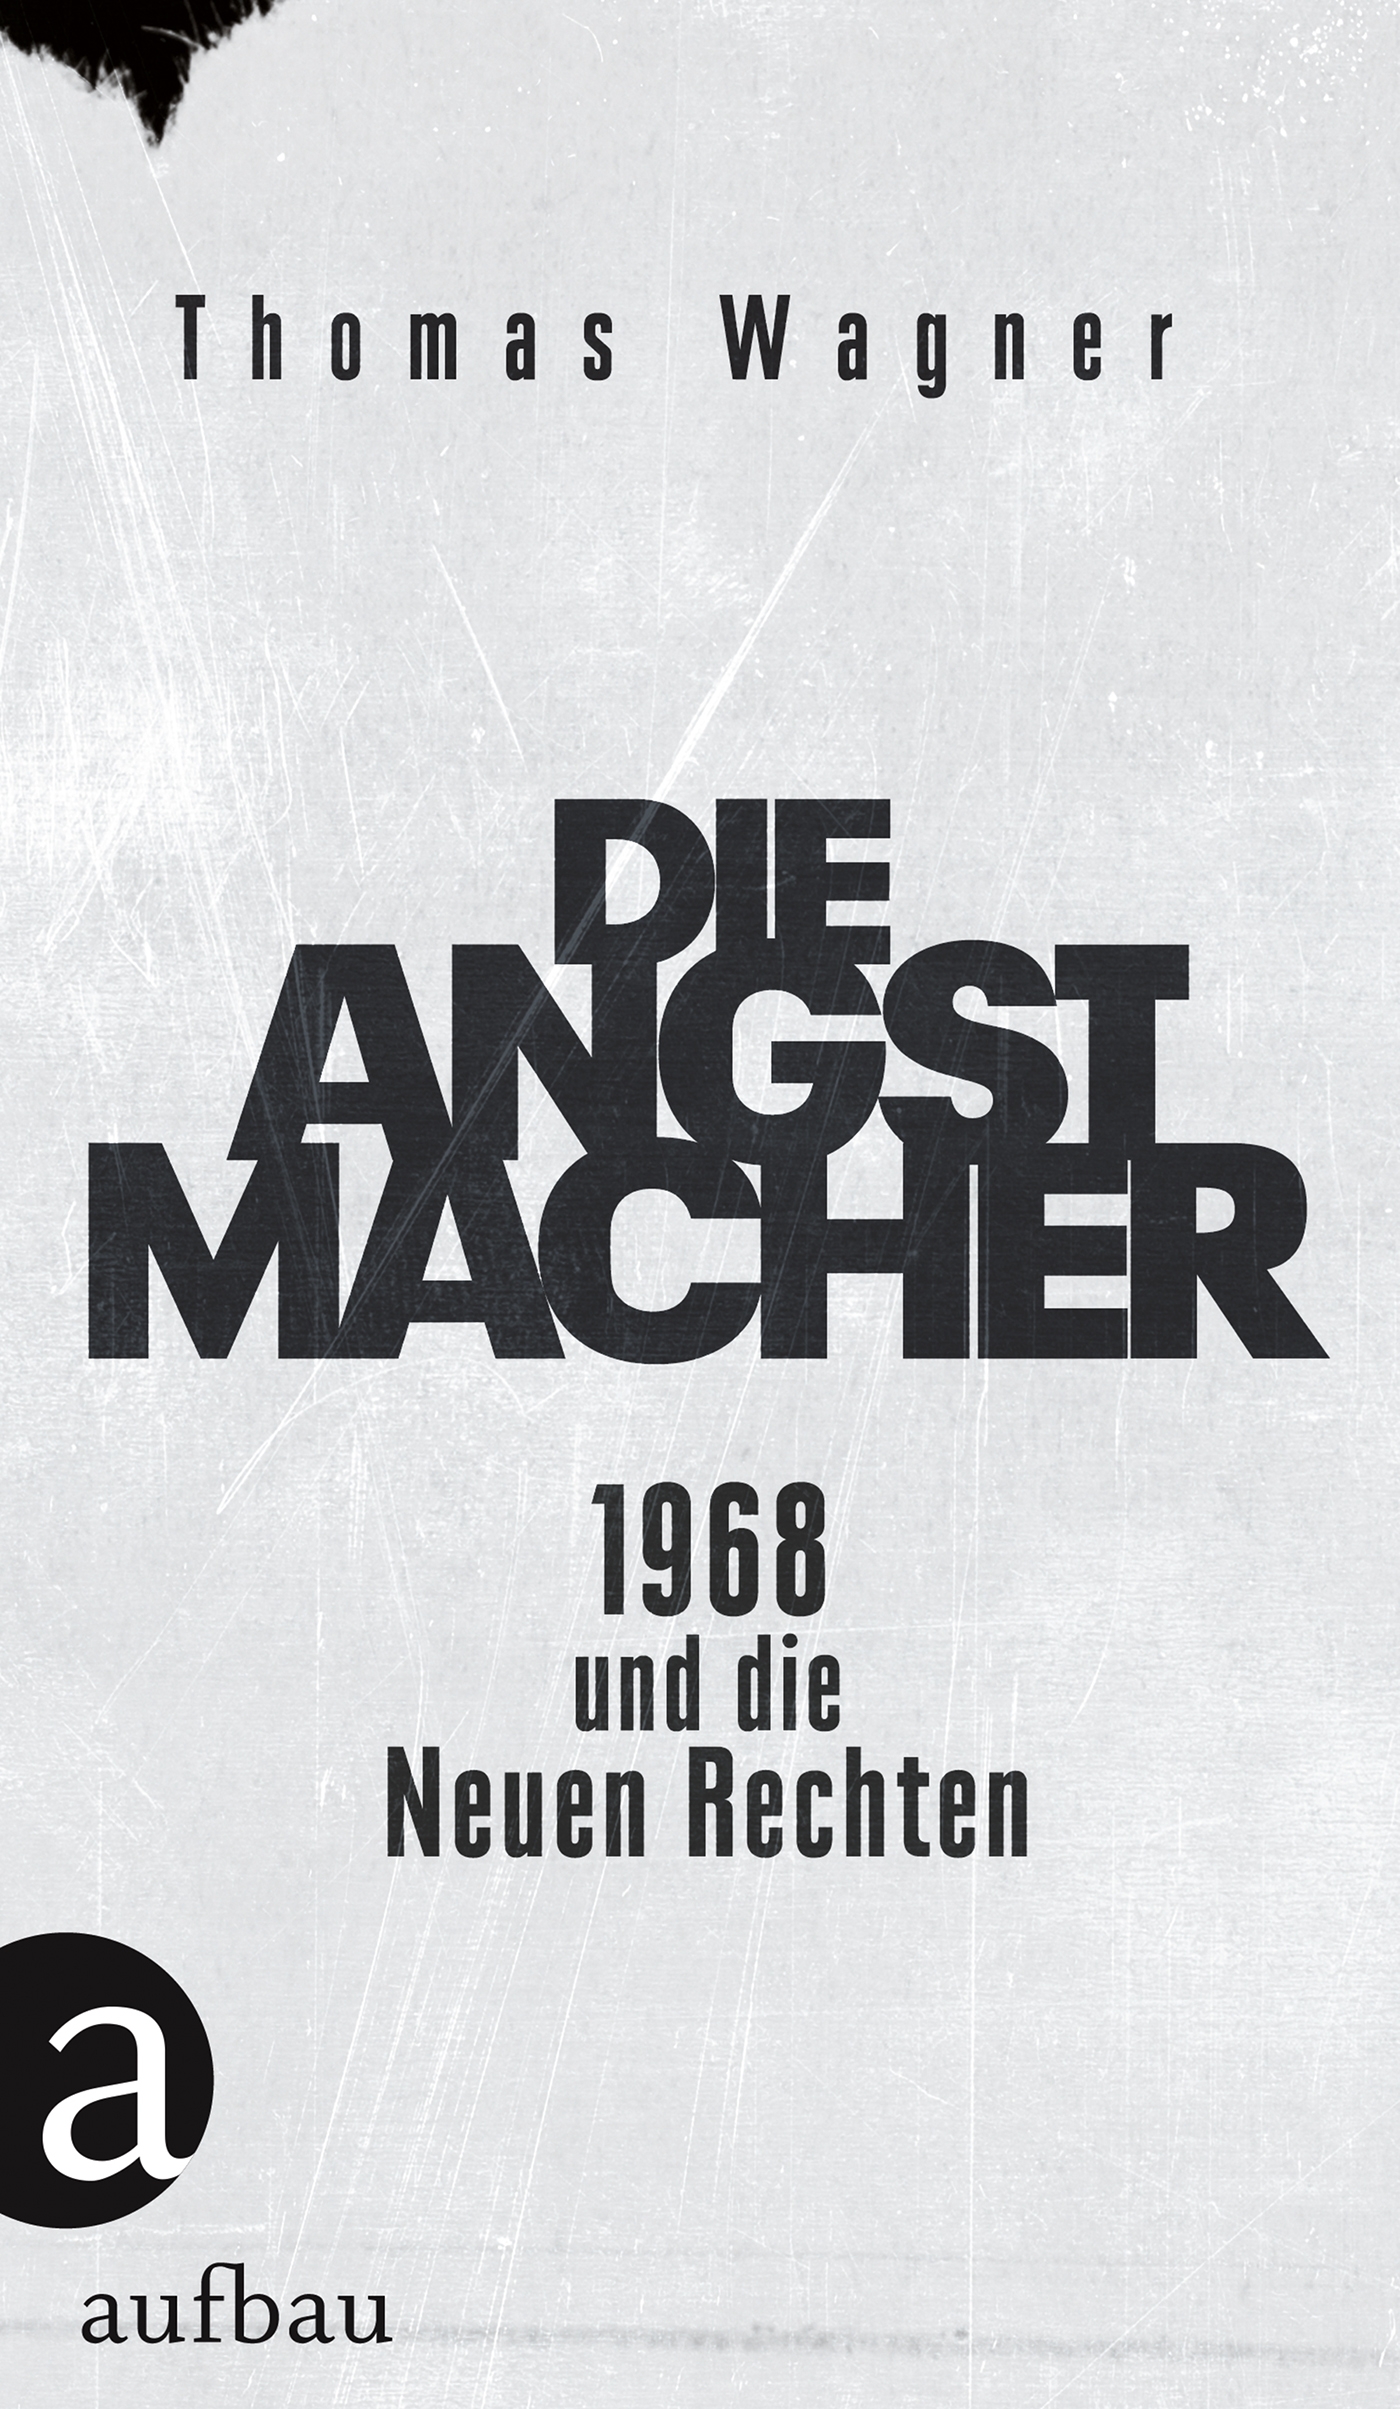 Die Angstmacher Thomas Wagner